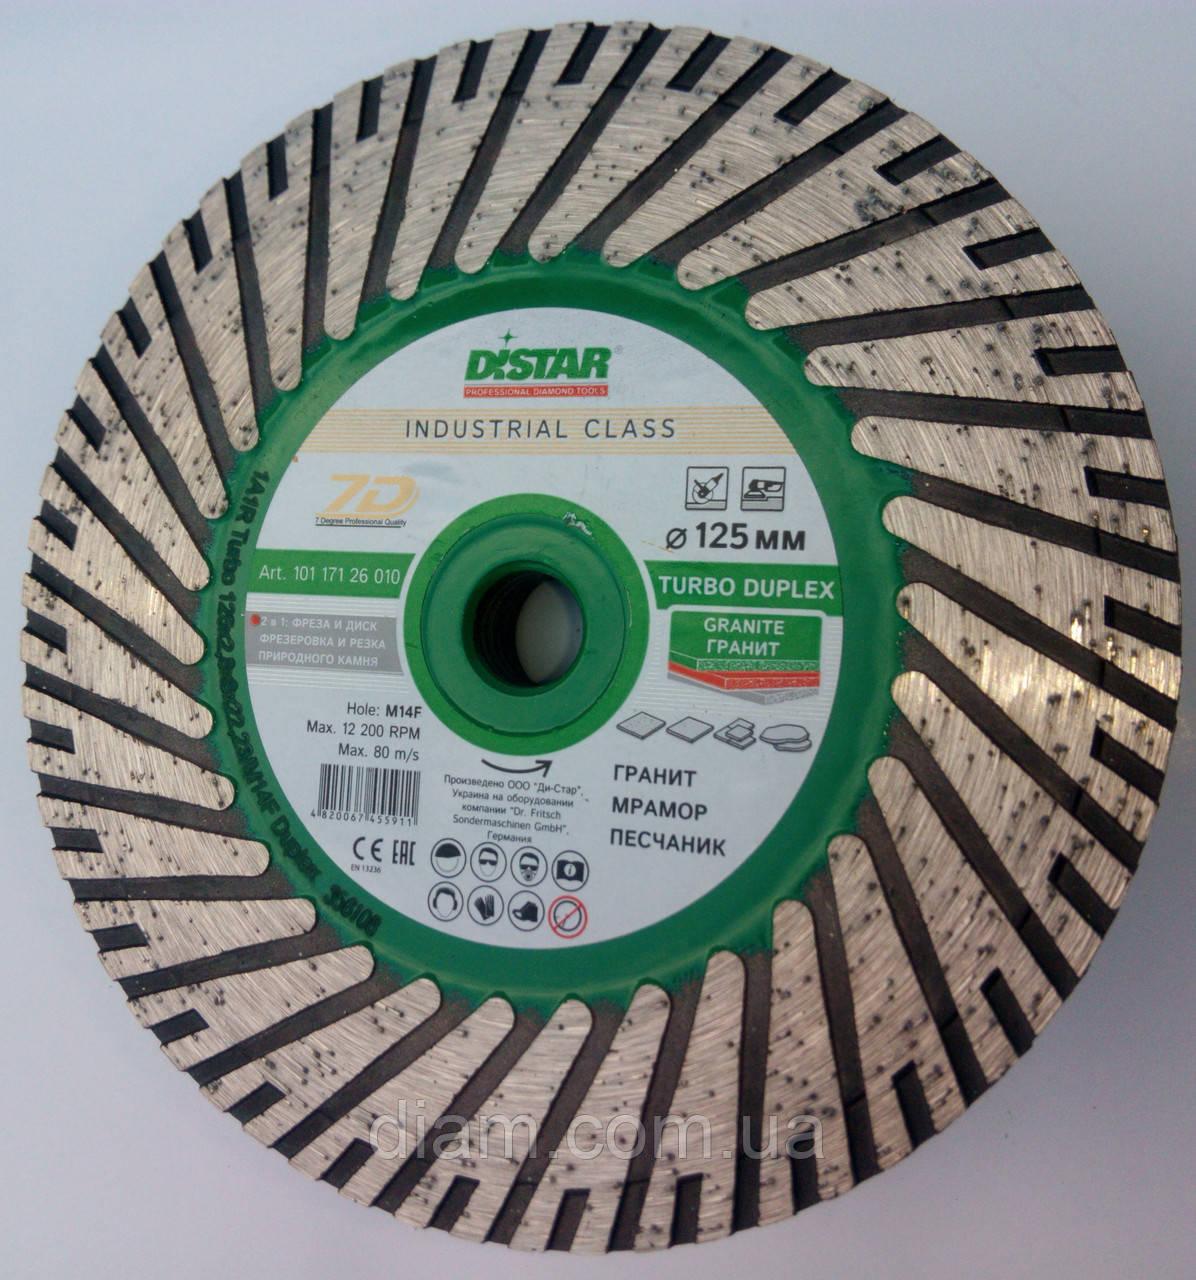 Алмазный диск на фланце для резки и шлифовки гранита Distar Duplex Turbo 125x2,8x8x22,23/M14F  - Diam интернет-магазин в Харькове